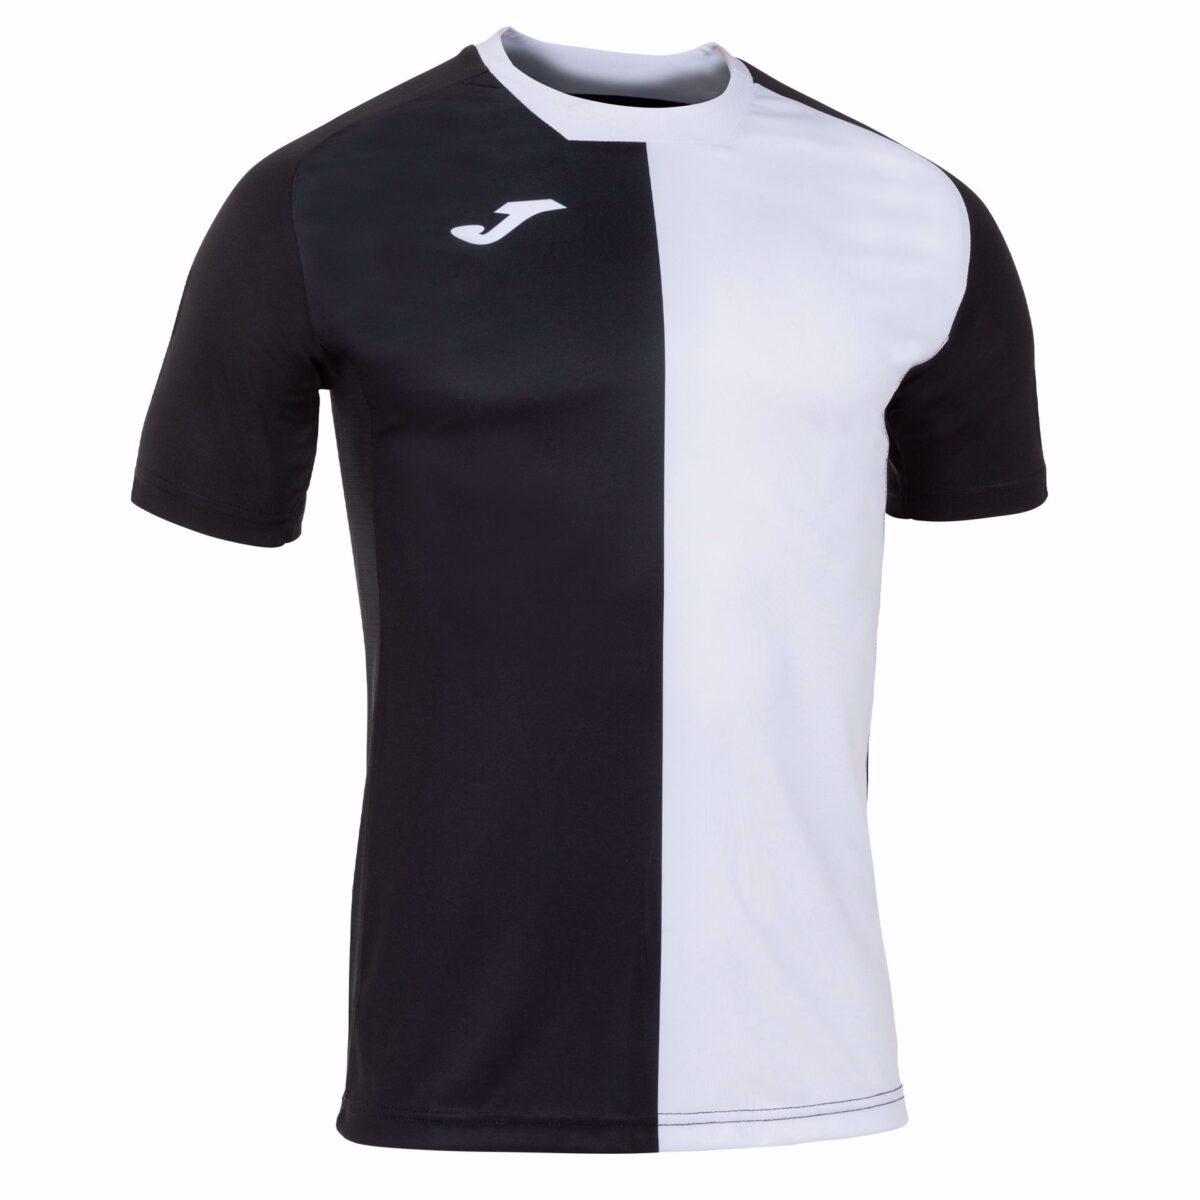 Joma City Adult S/S Football Shirt 101546